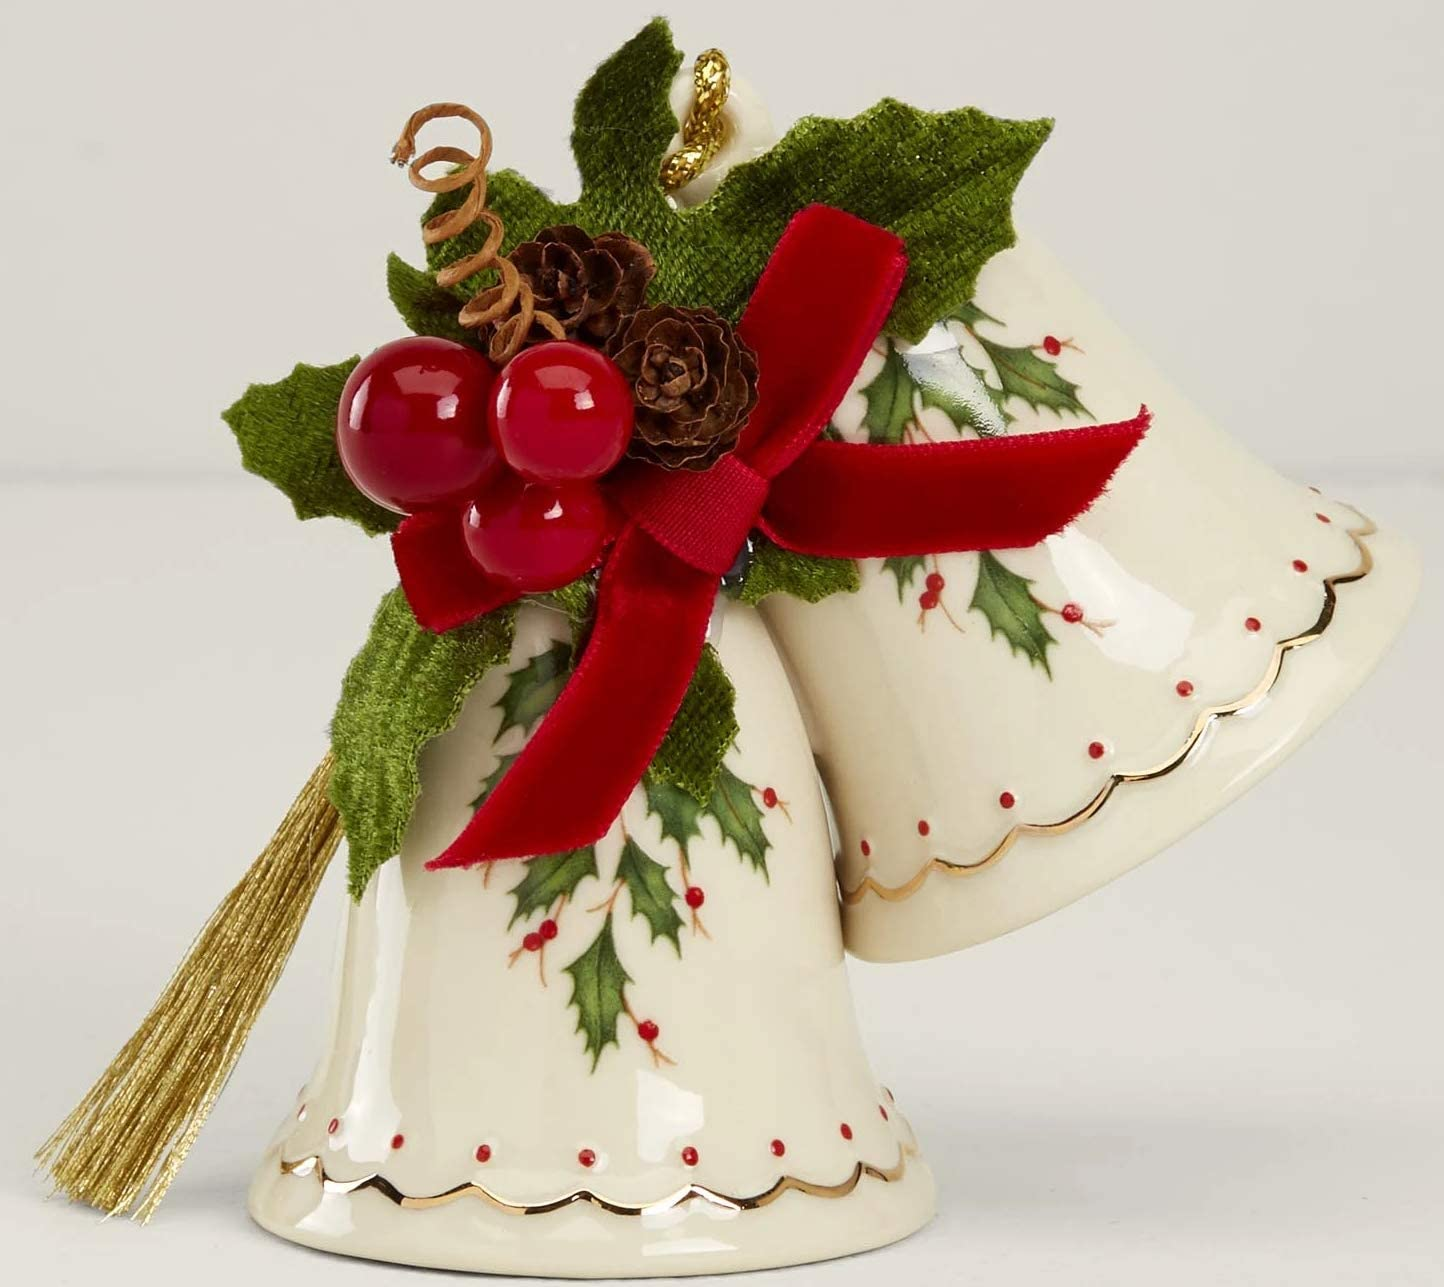 Lenox Holiday Xmas Jingle Bells mistletoe Porcelai Ranking TOP19 with Ornament Elegant